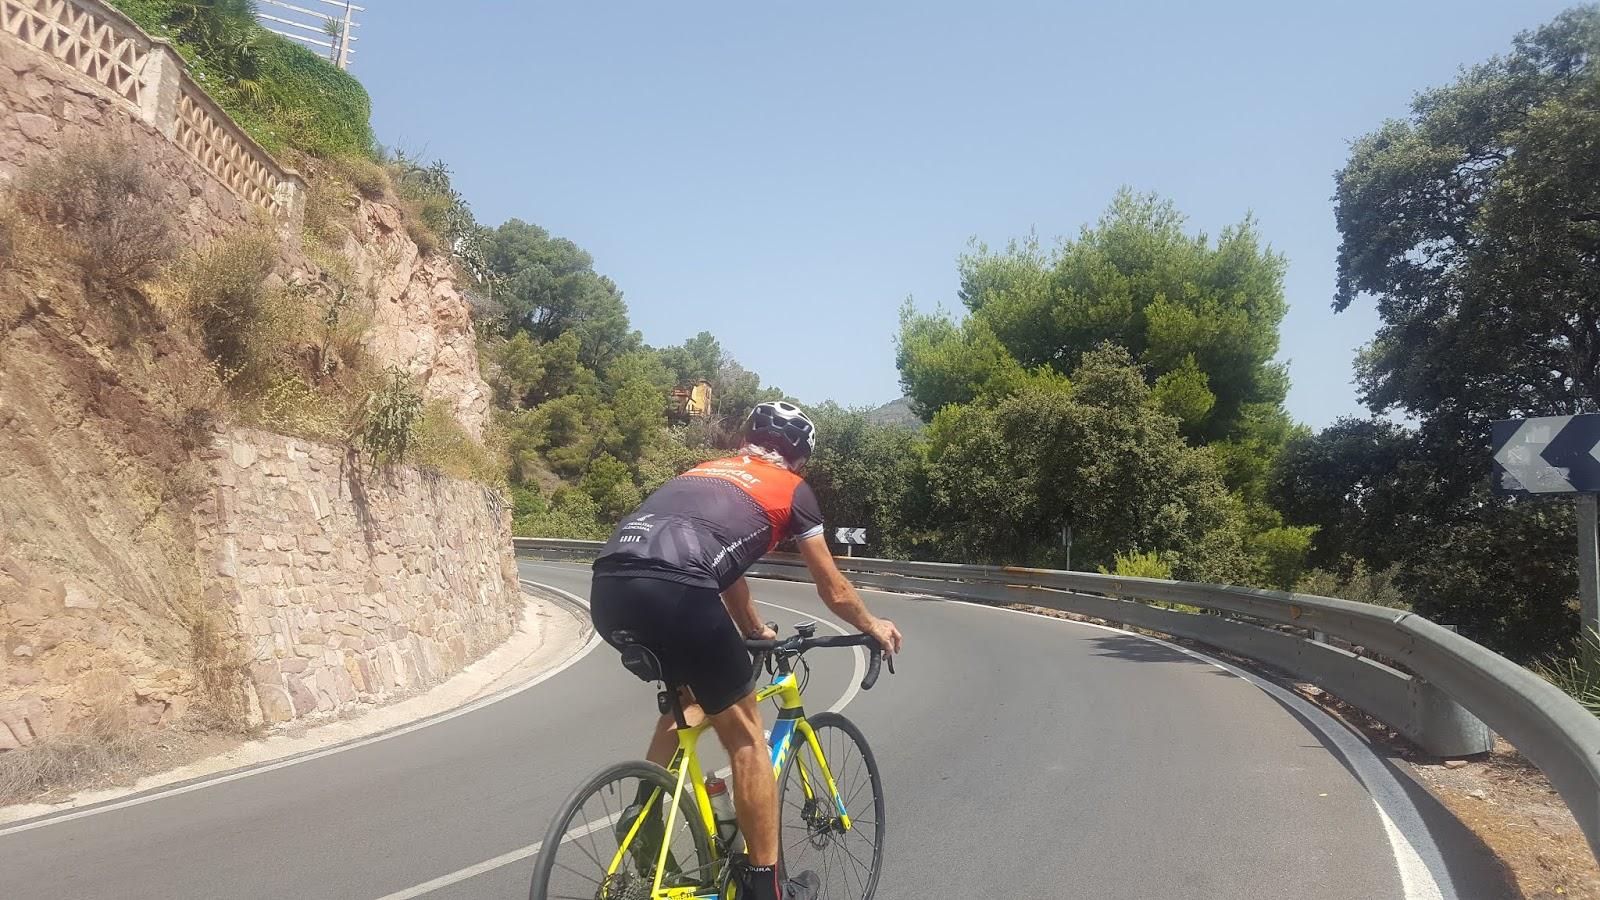 Cyclists climbing Puerto de l'Oronet, Sierra Calderona, Valencia, Spain